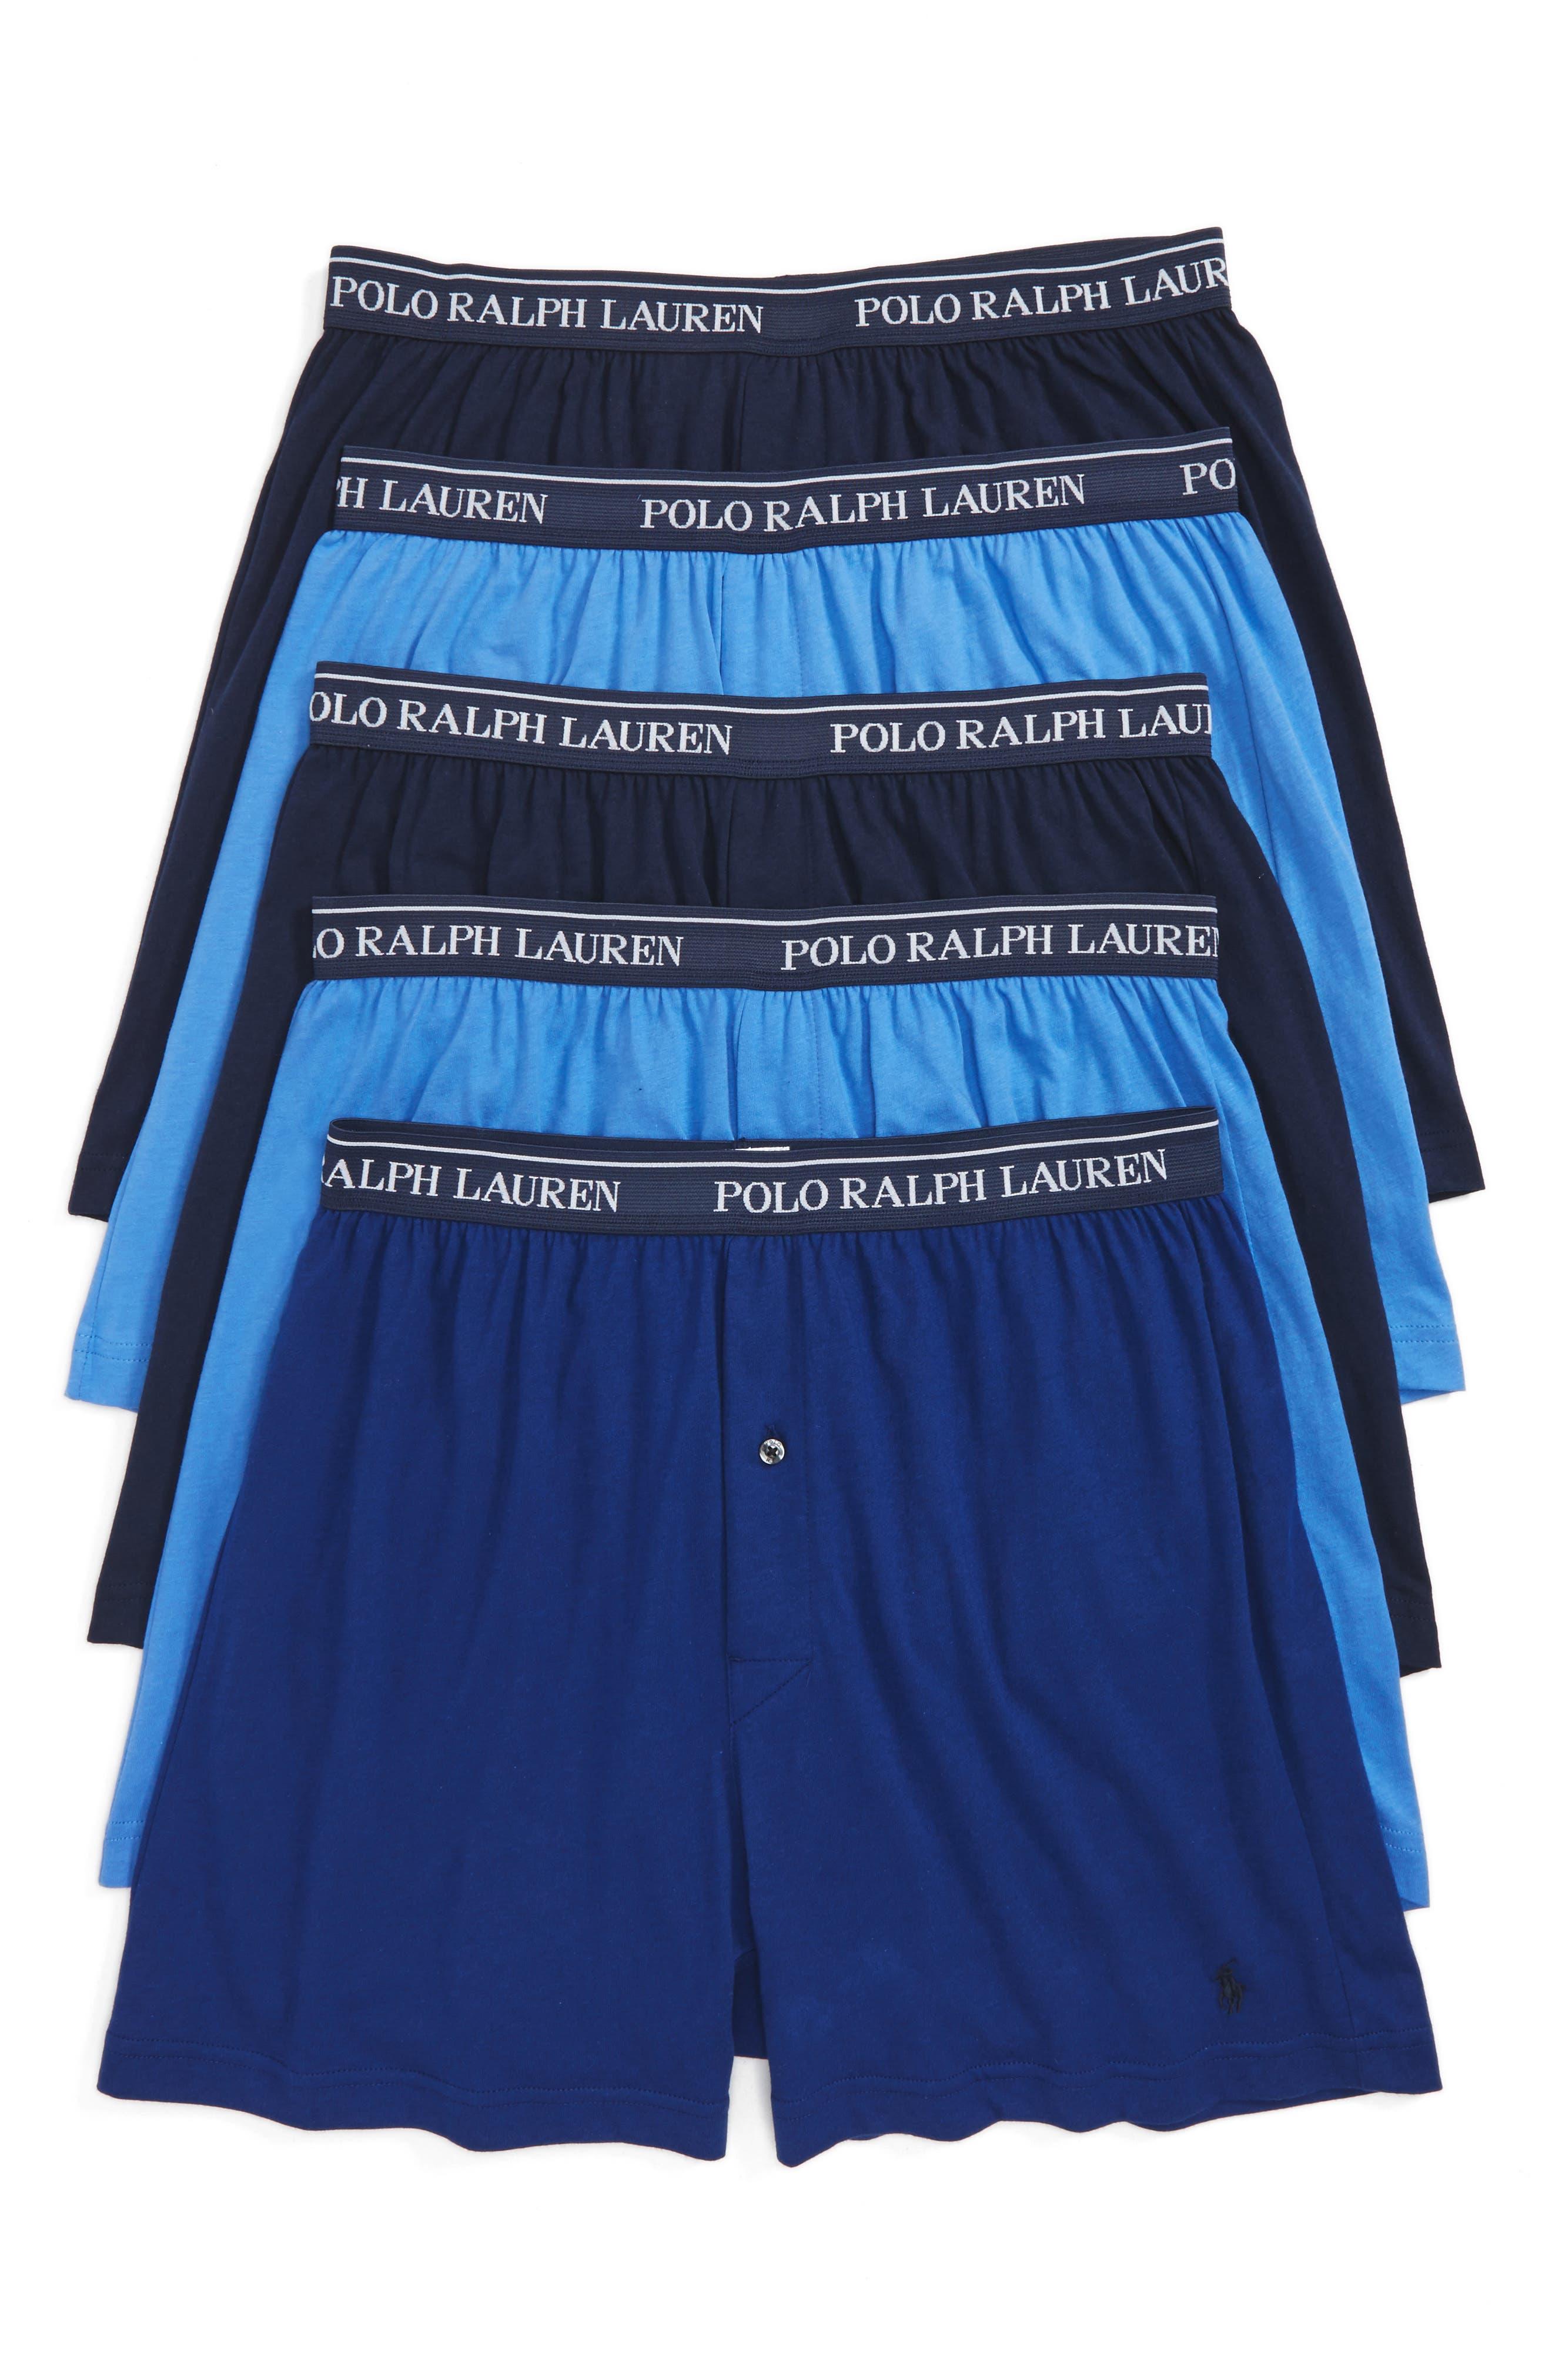 5-Pack Cotton Boxers,                         Main,                         color, BLUE/ ROYAL BLUE/ NAVY